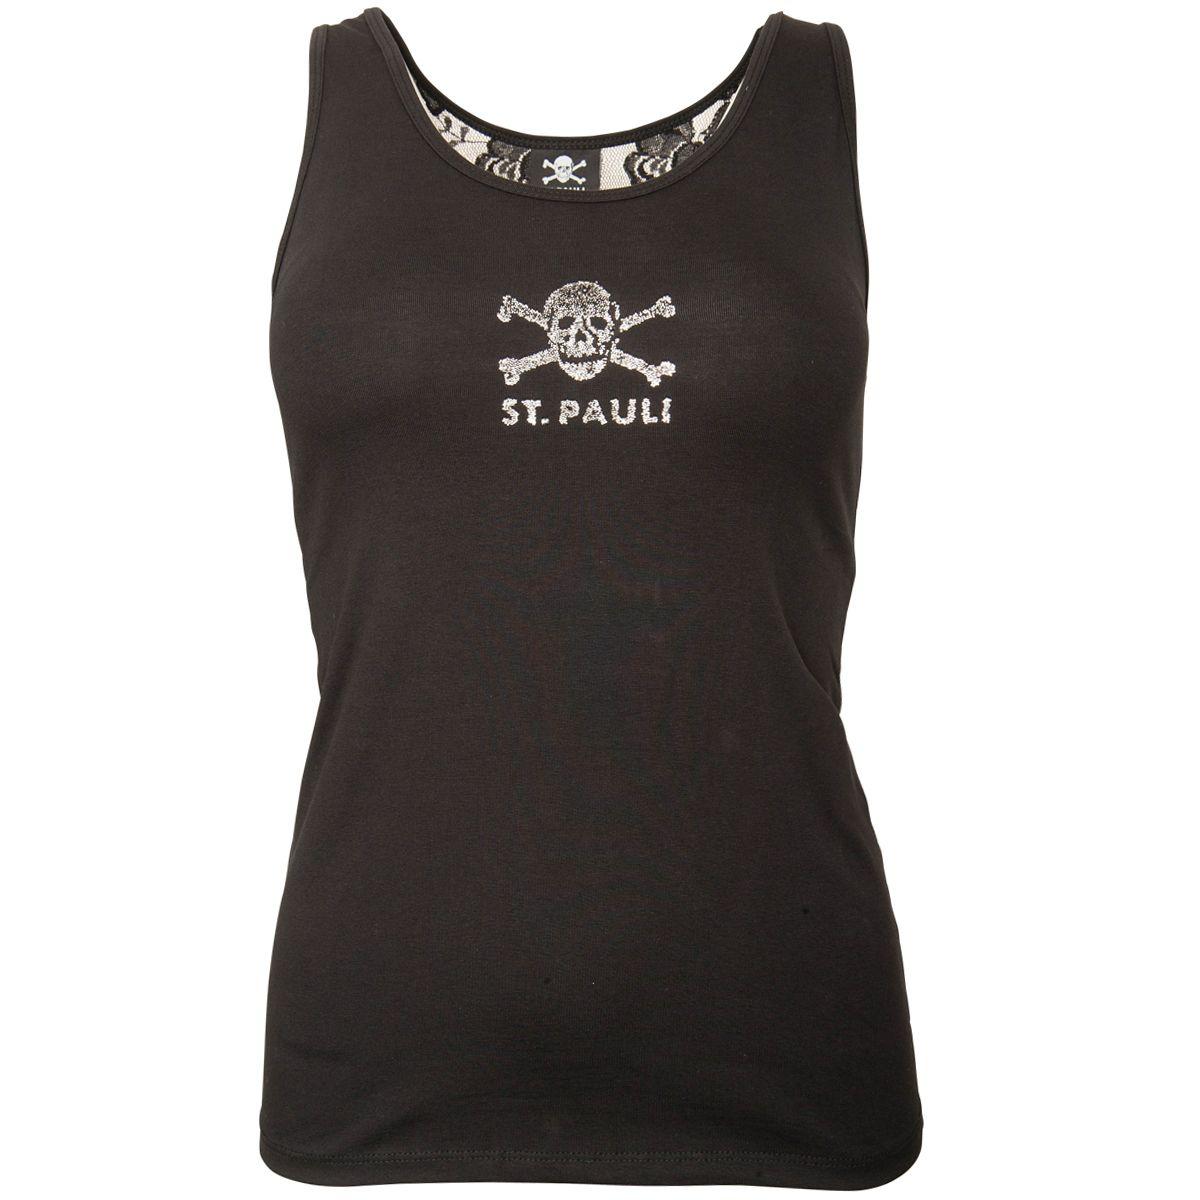 FC St. Pauli - Damen Tanktop Punk & Lace - schwarz